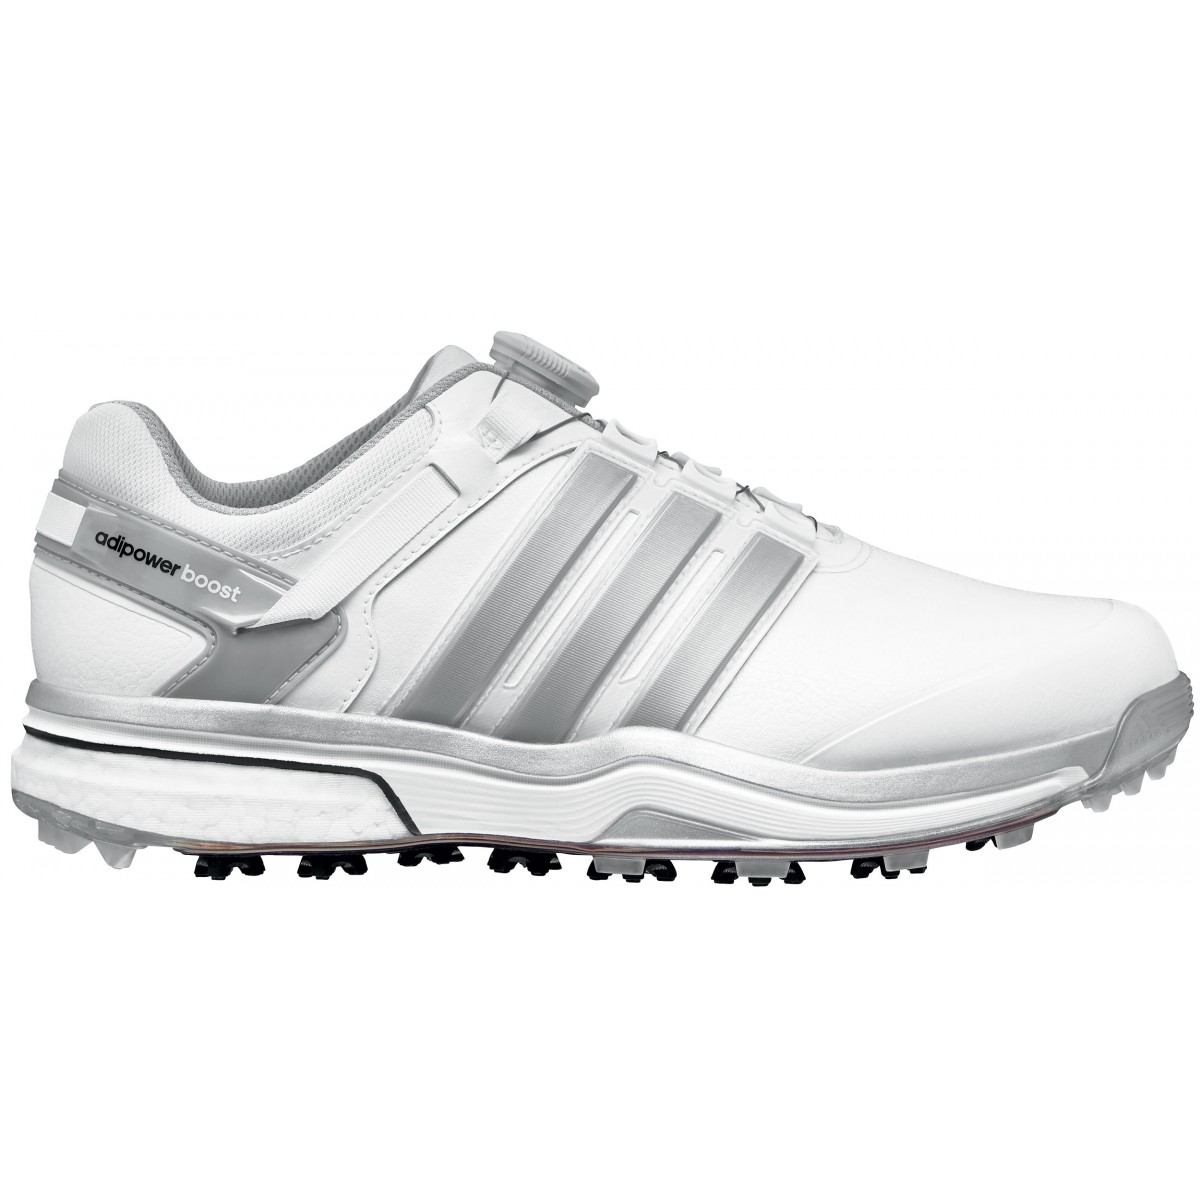 Adidas Adipower Boost Boa corriendo blanco / Dark Silver Metallic